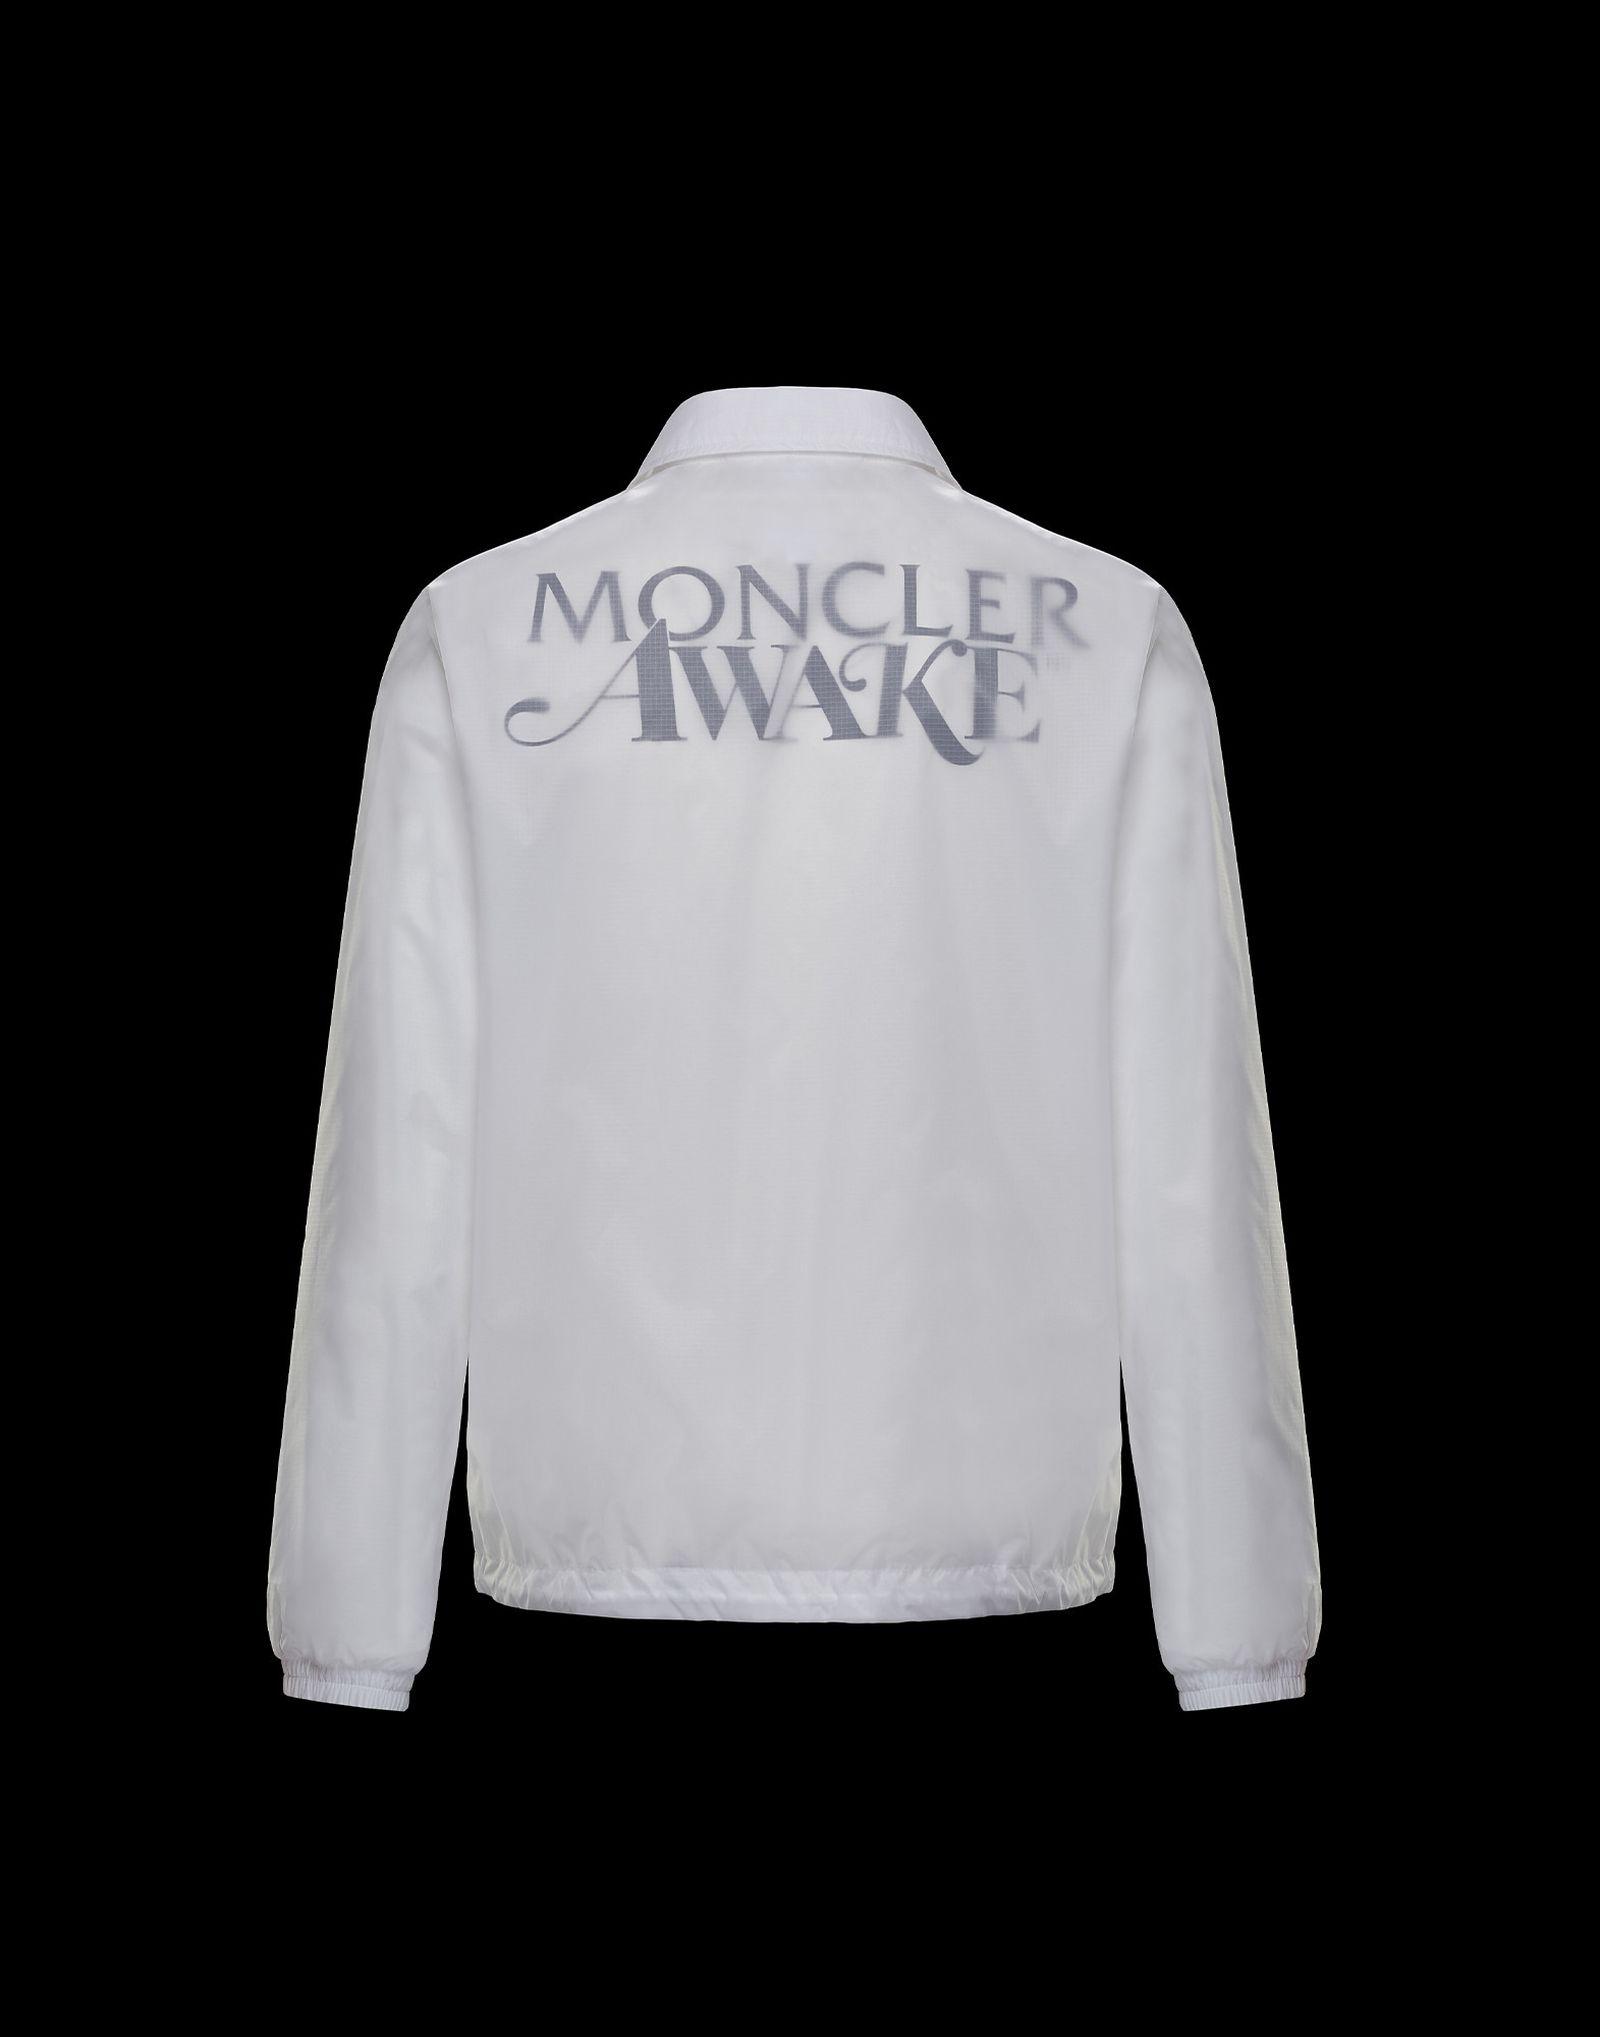 moncler-1952-awake-collaboraiton-03